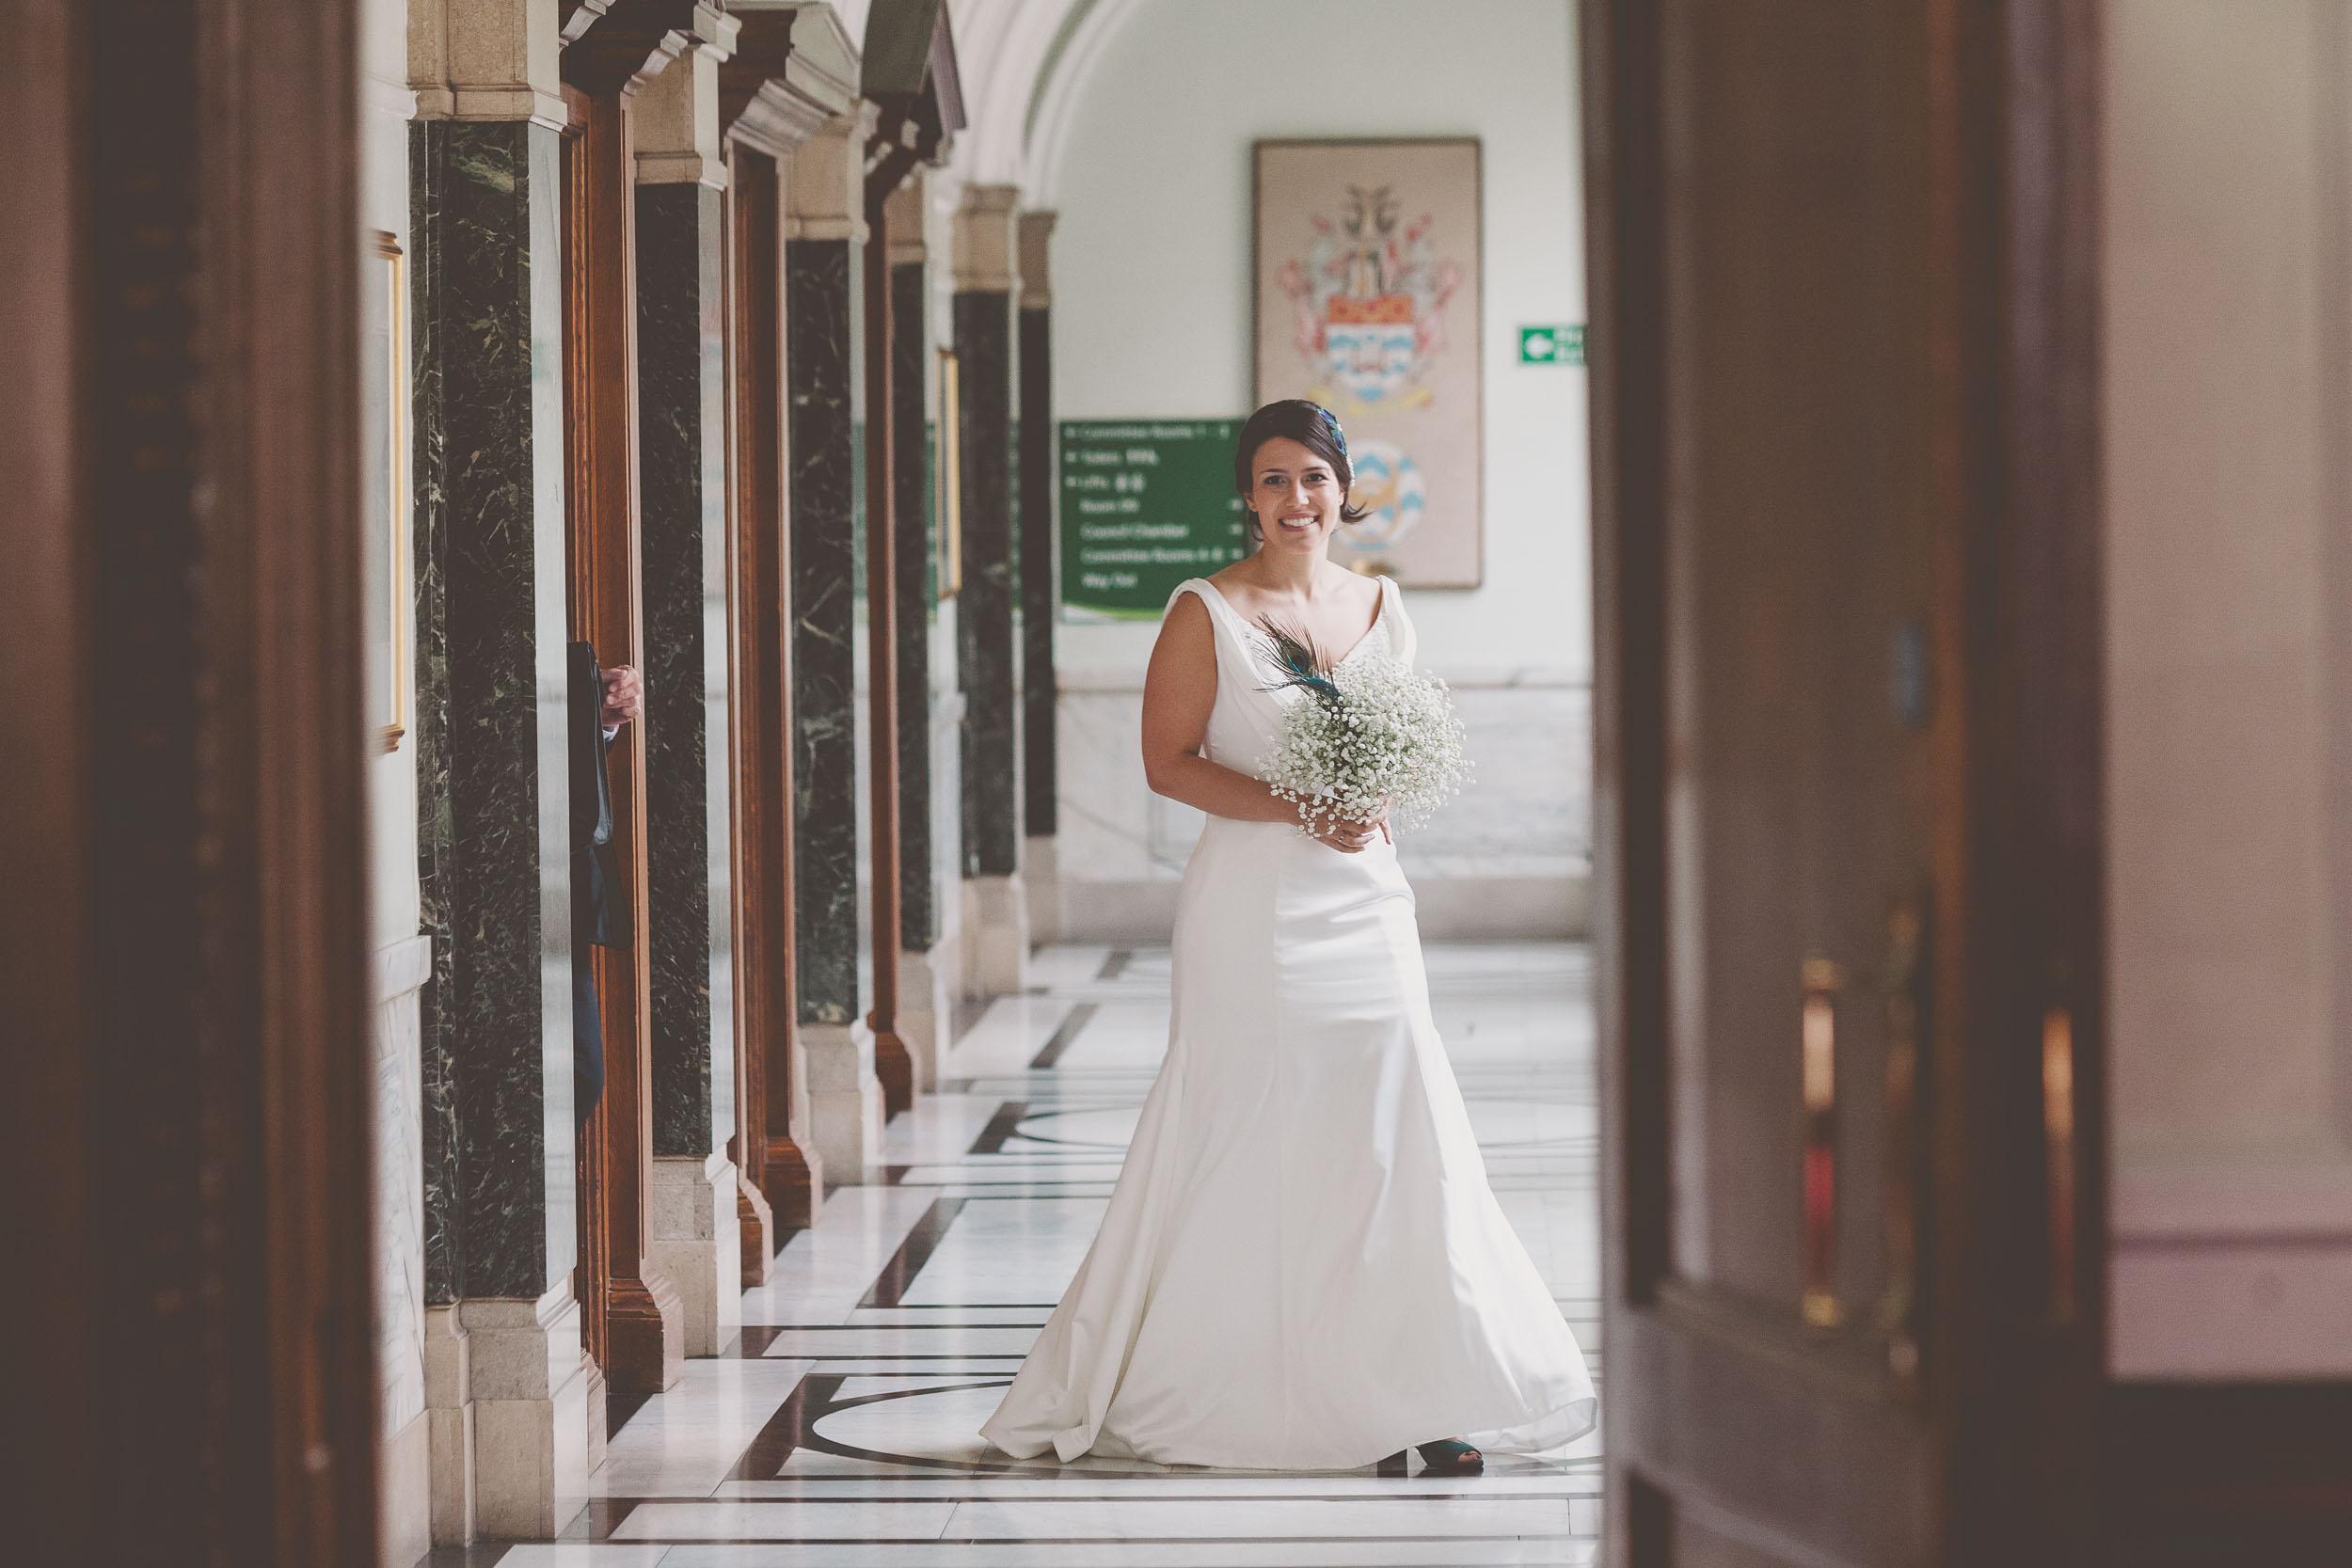 islington-town-hall-4th-floor-studios-wedding034.jpg